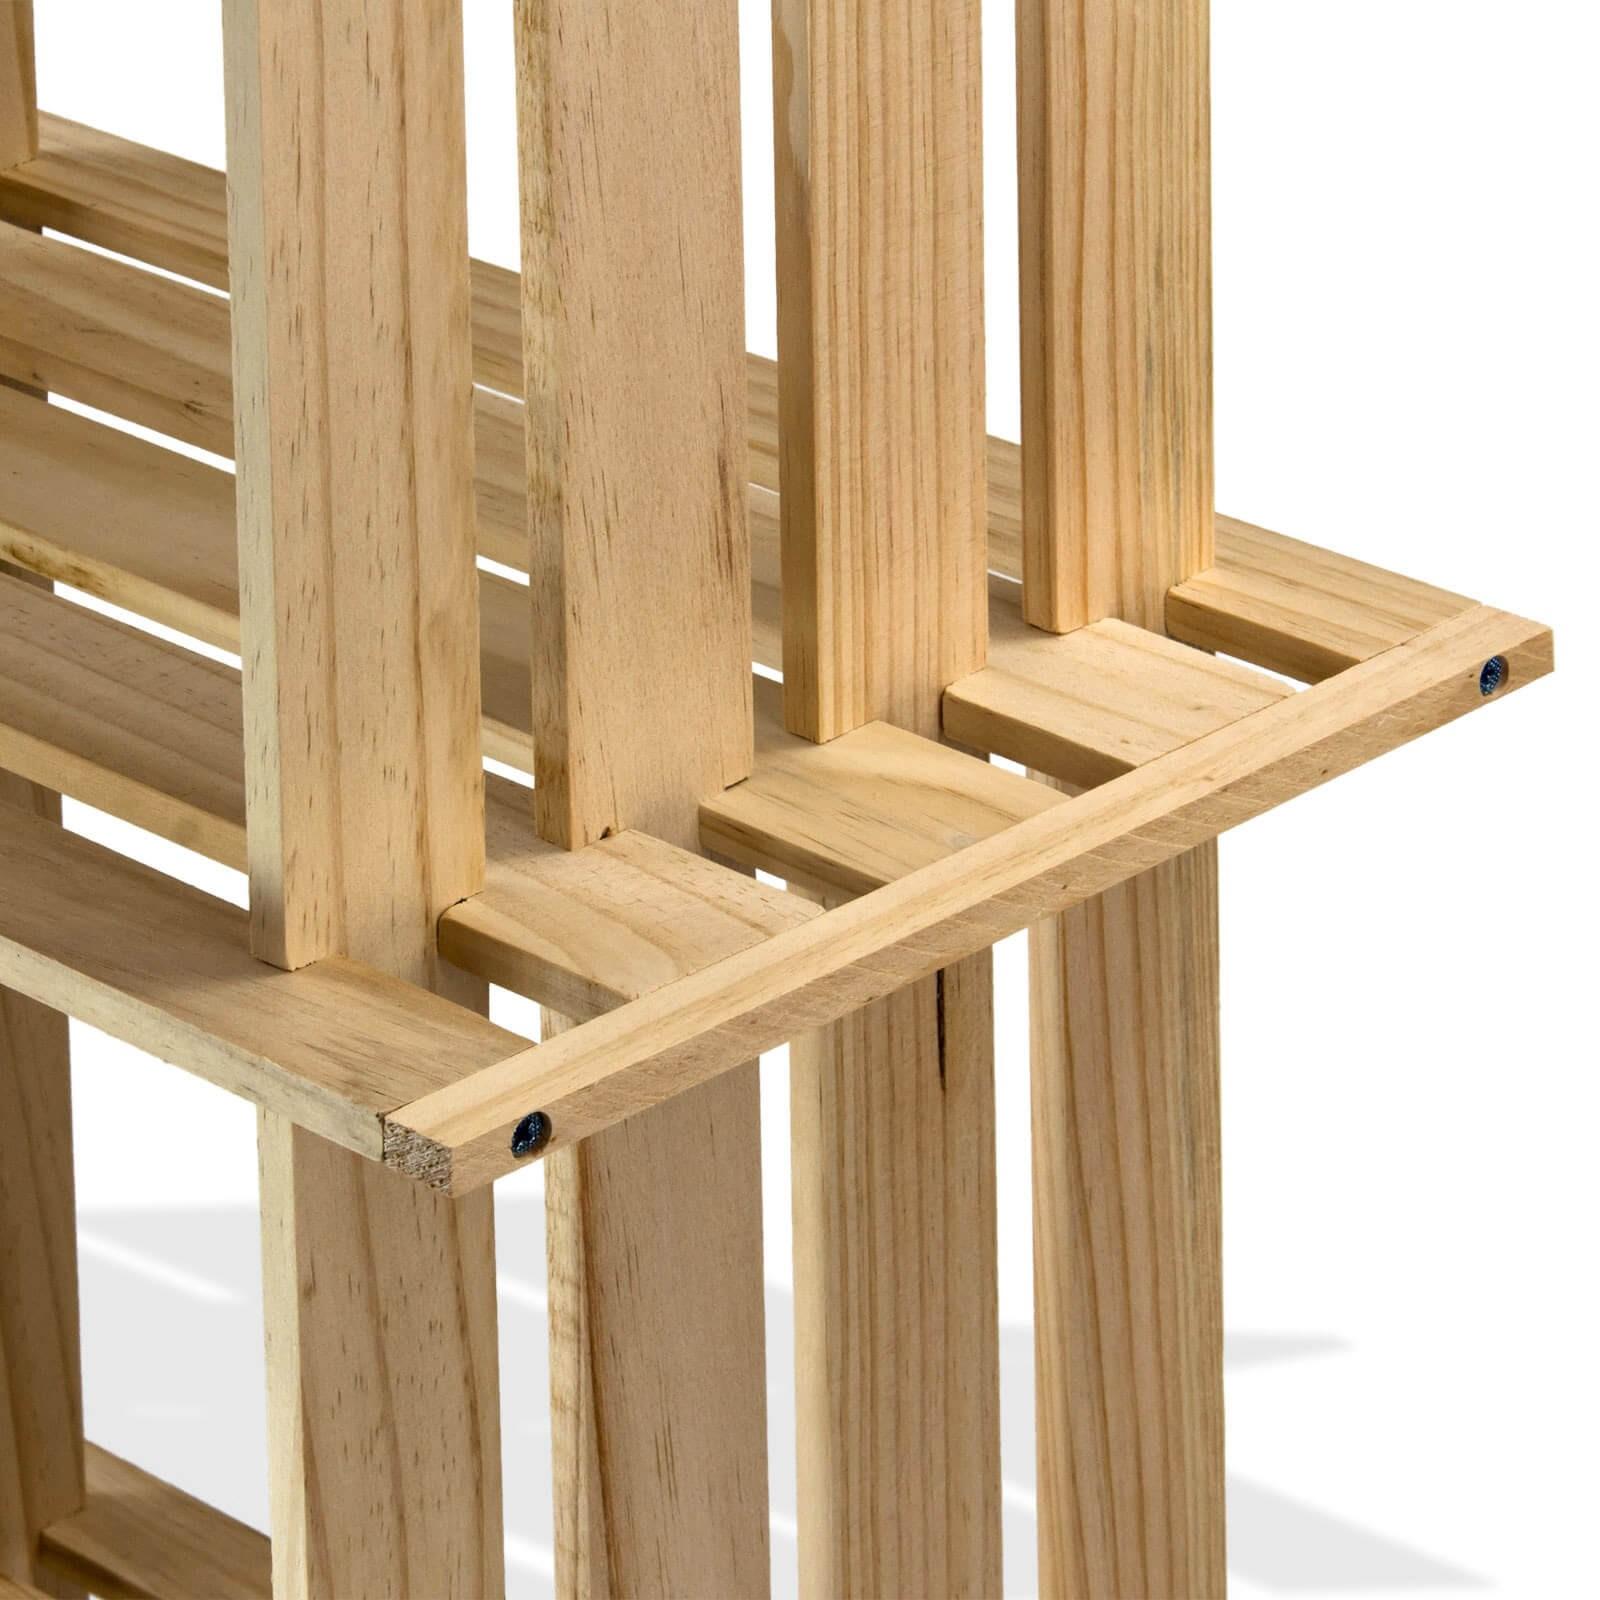 design b cherregal standregal raumteiler aus holz 6 w rfel. Black Bedroom Furniture Sets. Home Design Ideas